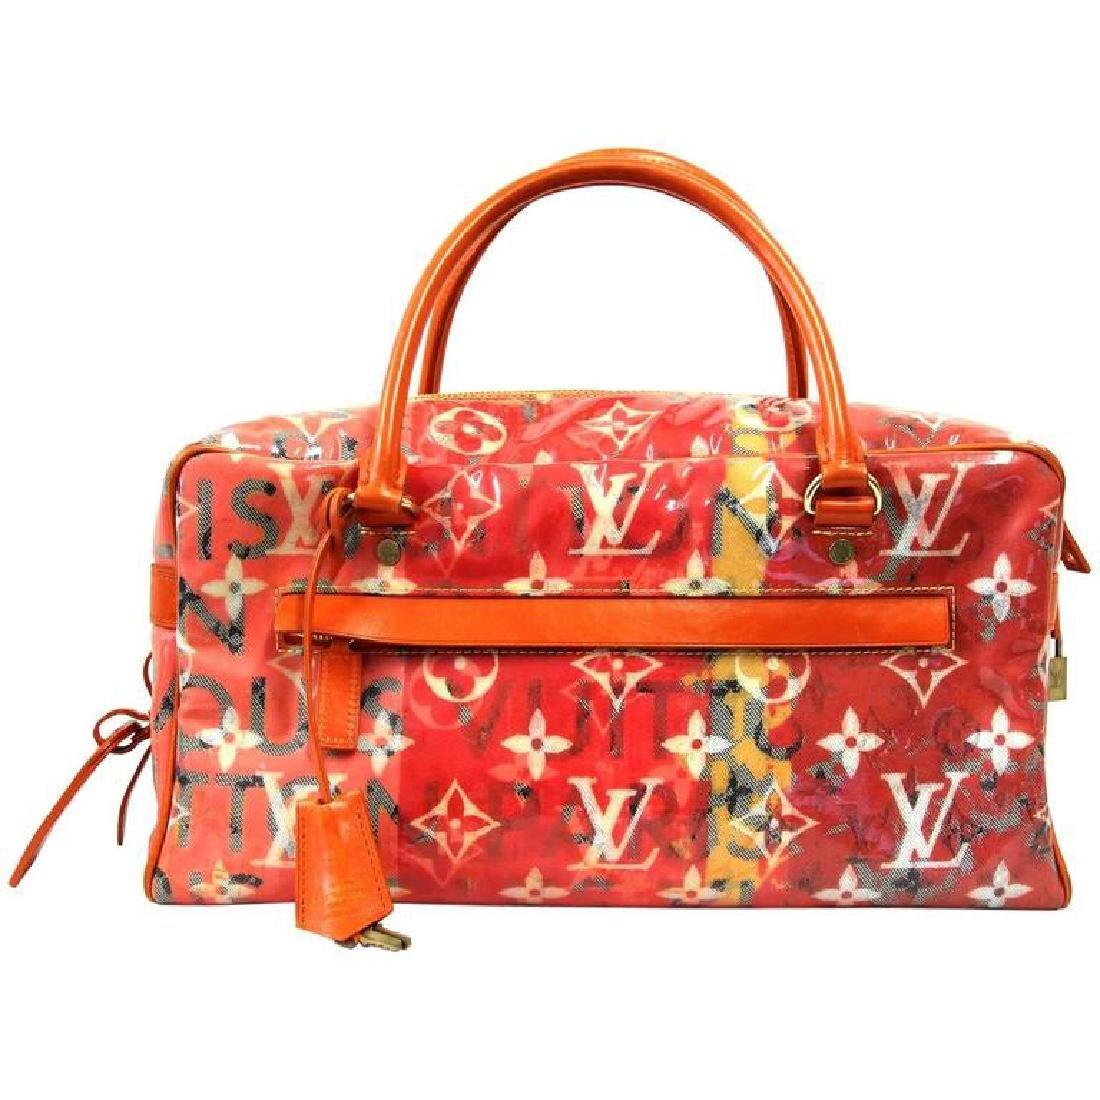 2008 Louis Vuitton Orange Special Edition Pulp